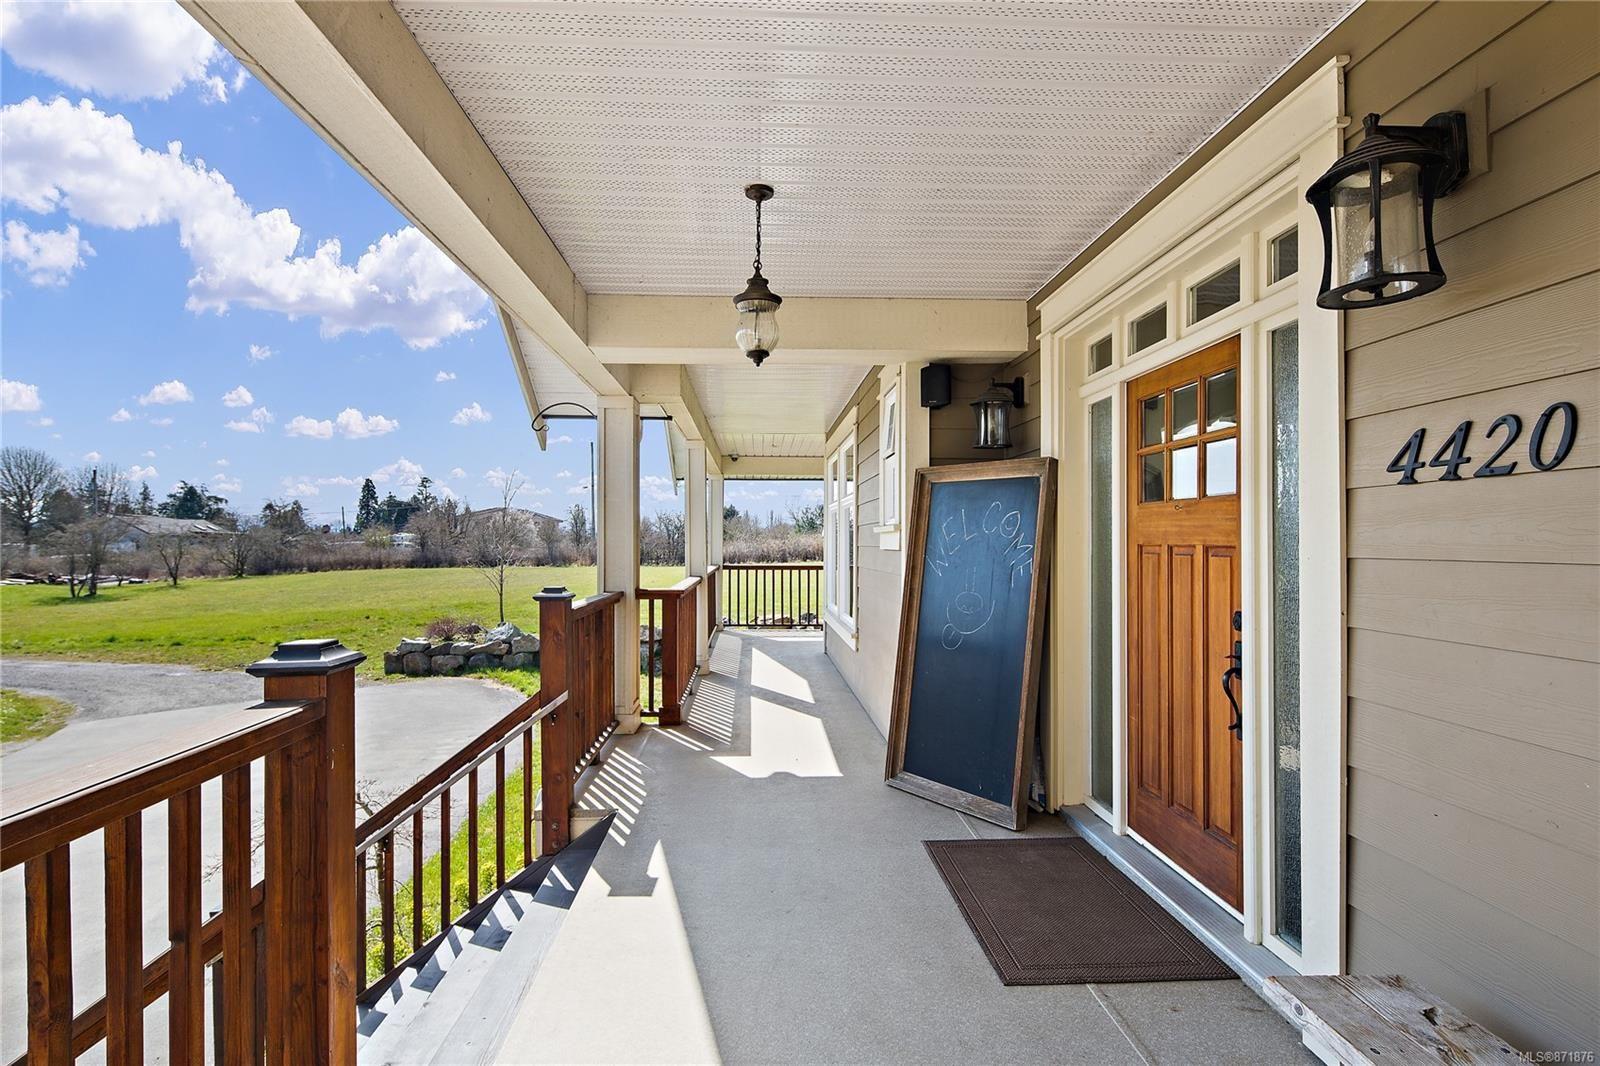 Photo 7: Photos: 4420 Wilkinson Rd in : SW Royal Oak House for sale (Saanich West)  : MLS®# 871876